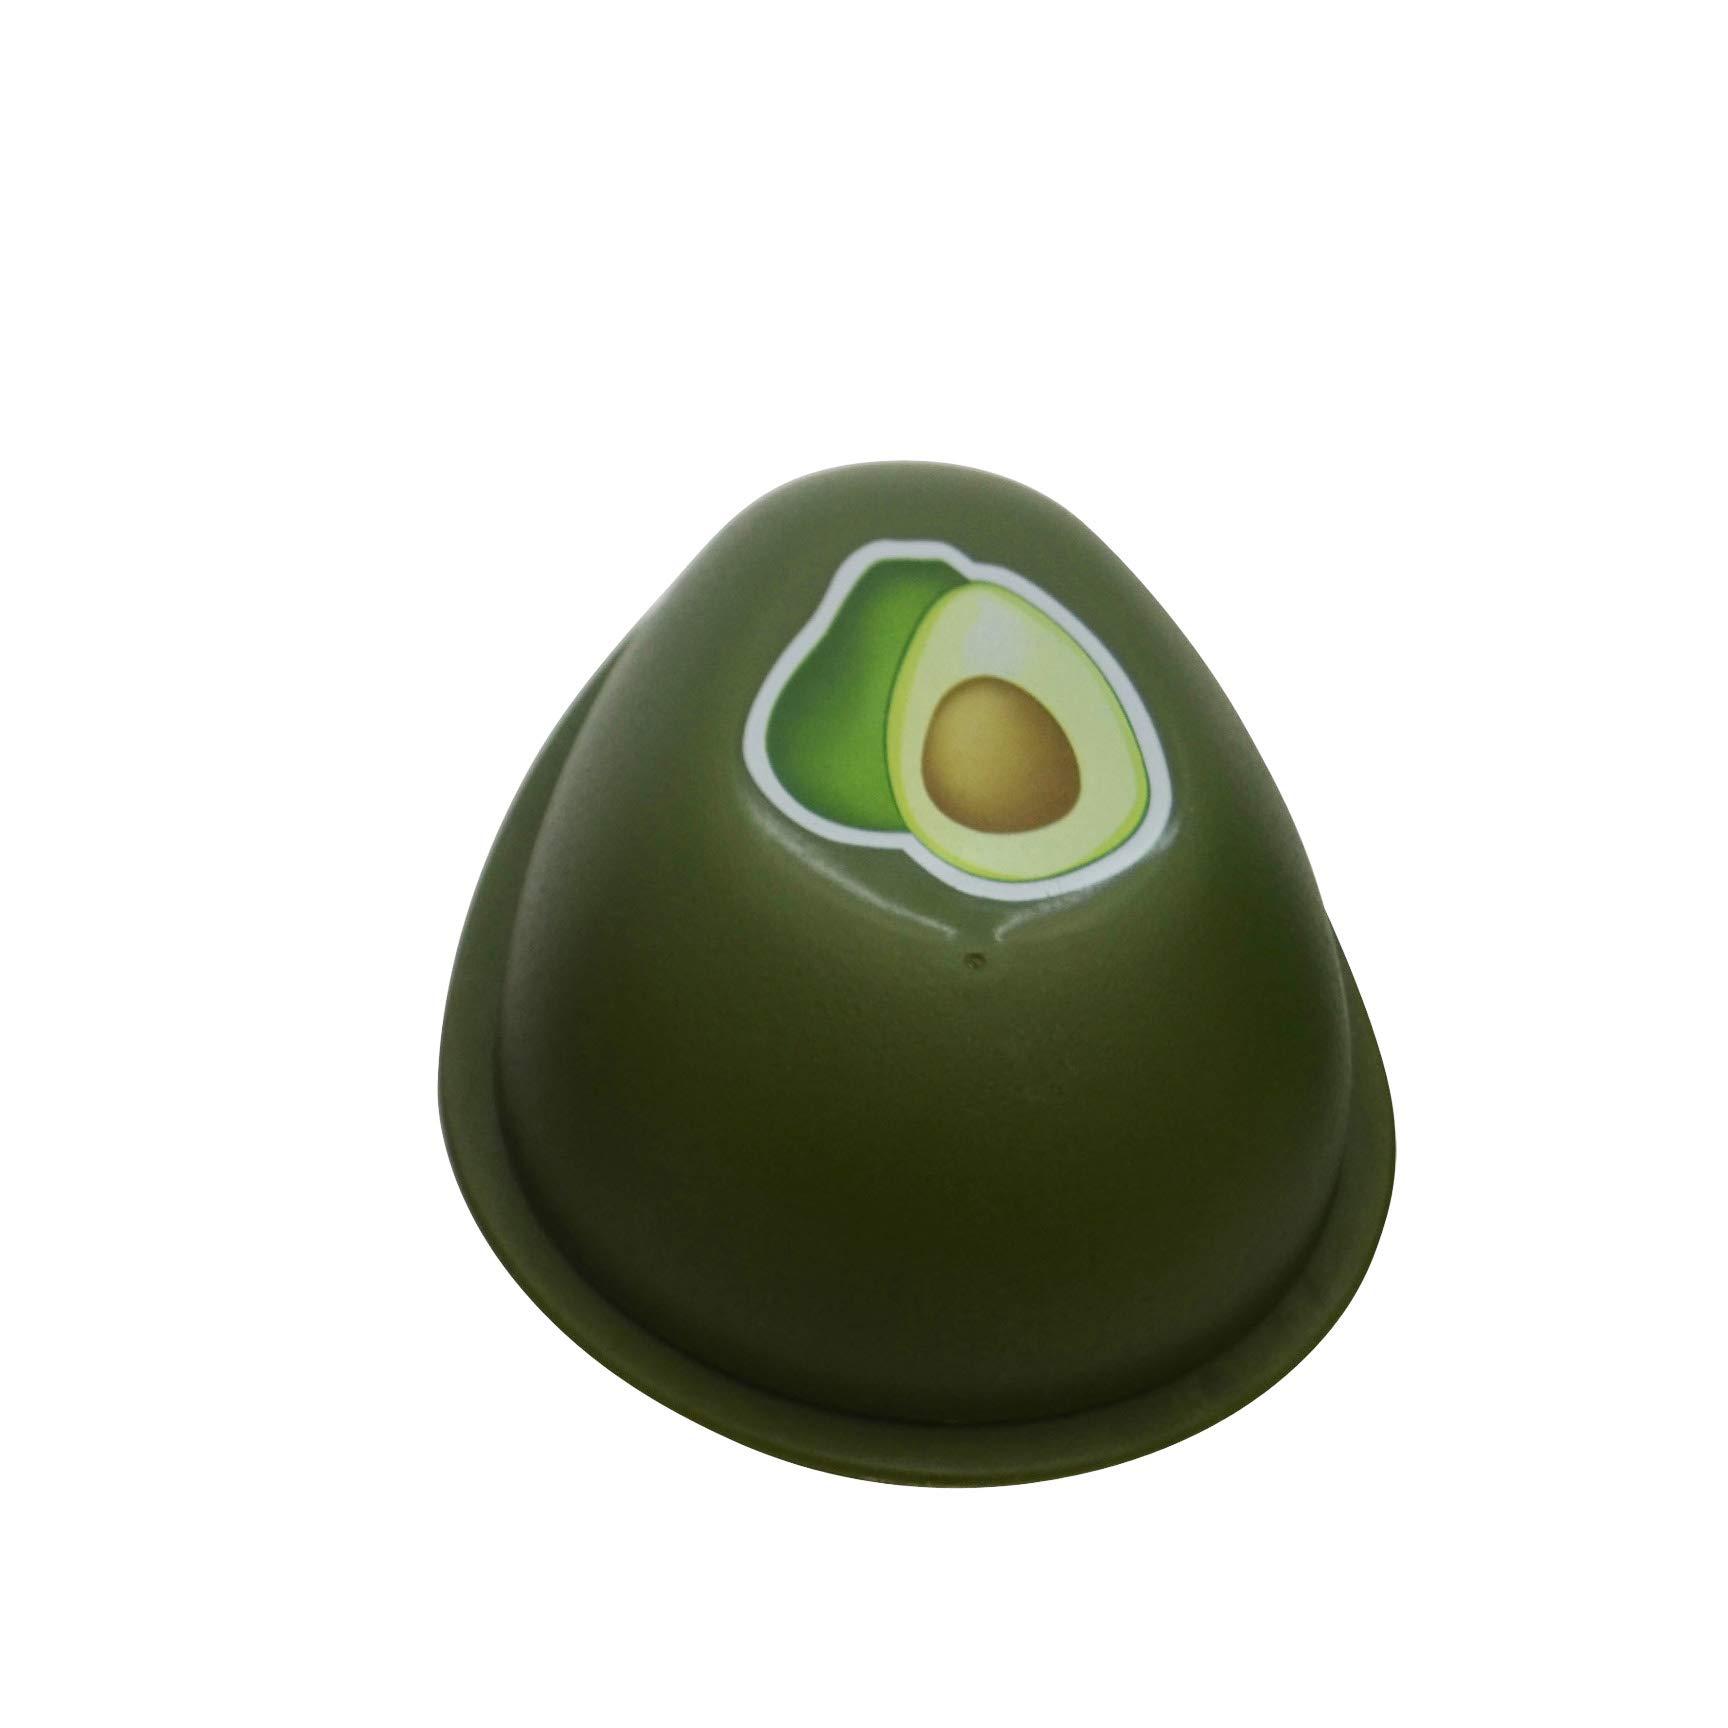 IMUSA USA IMU-71203 Avocado Saver/Container, 3'' Green